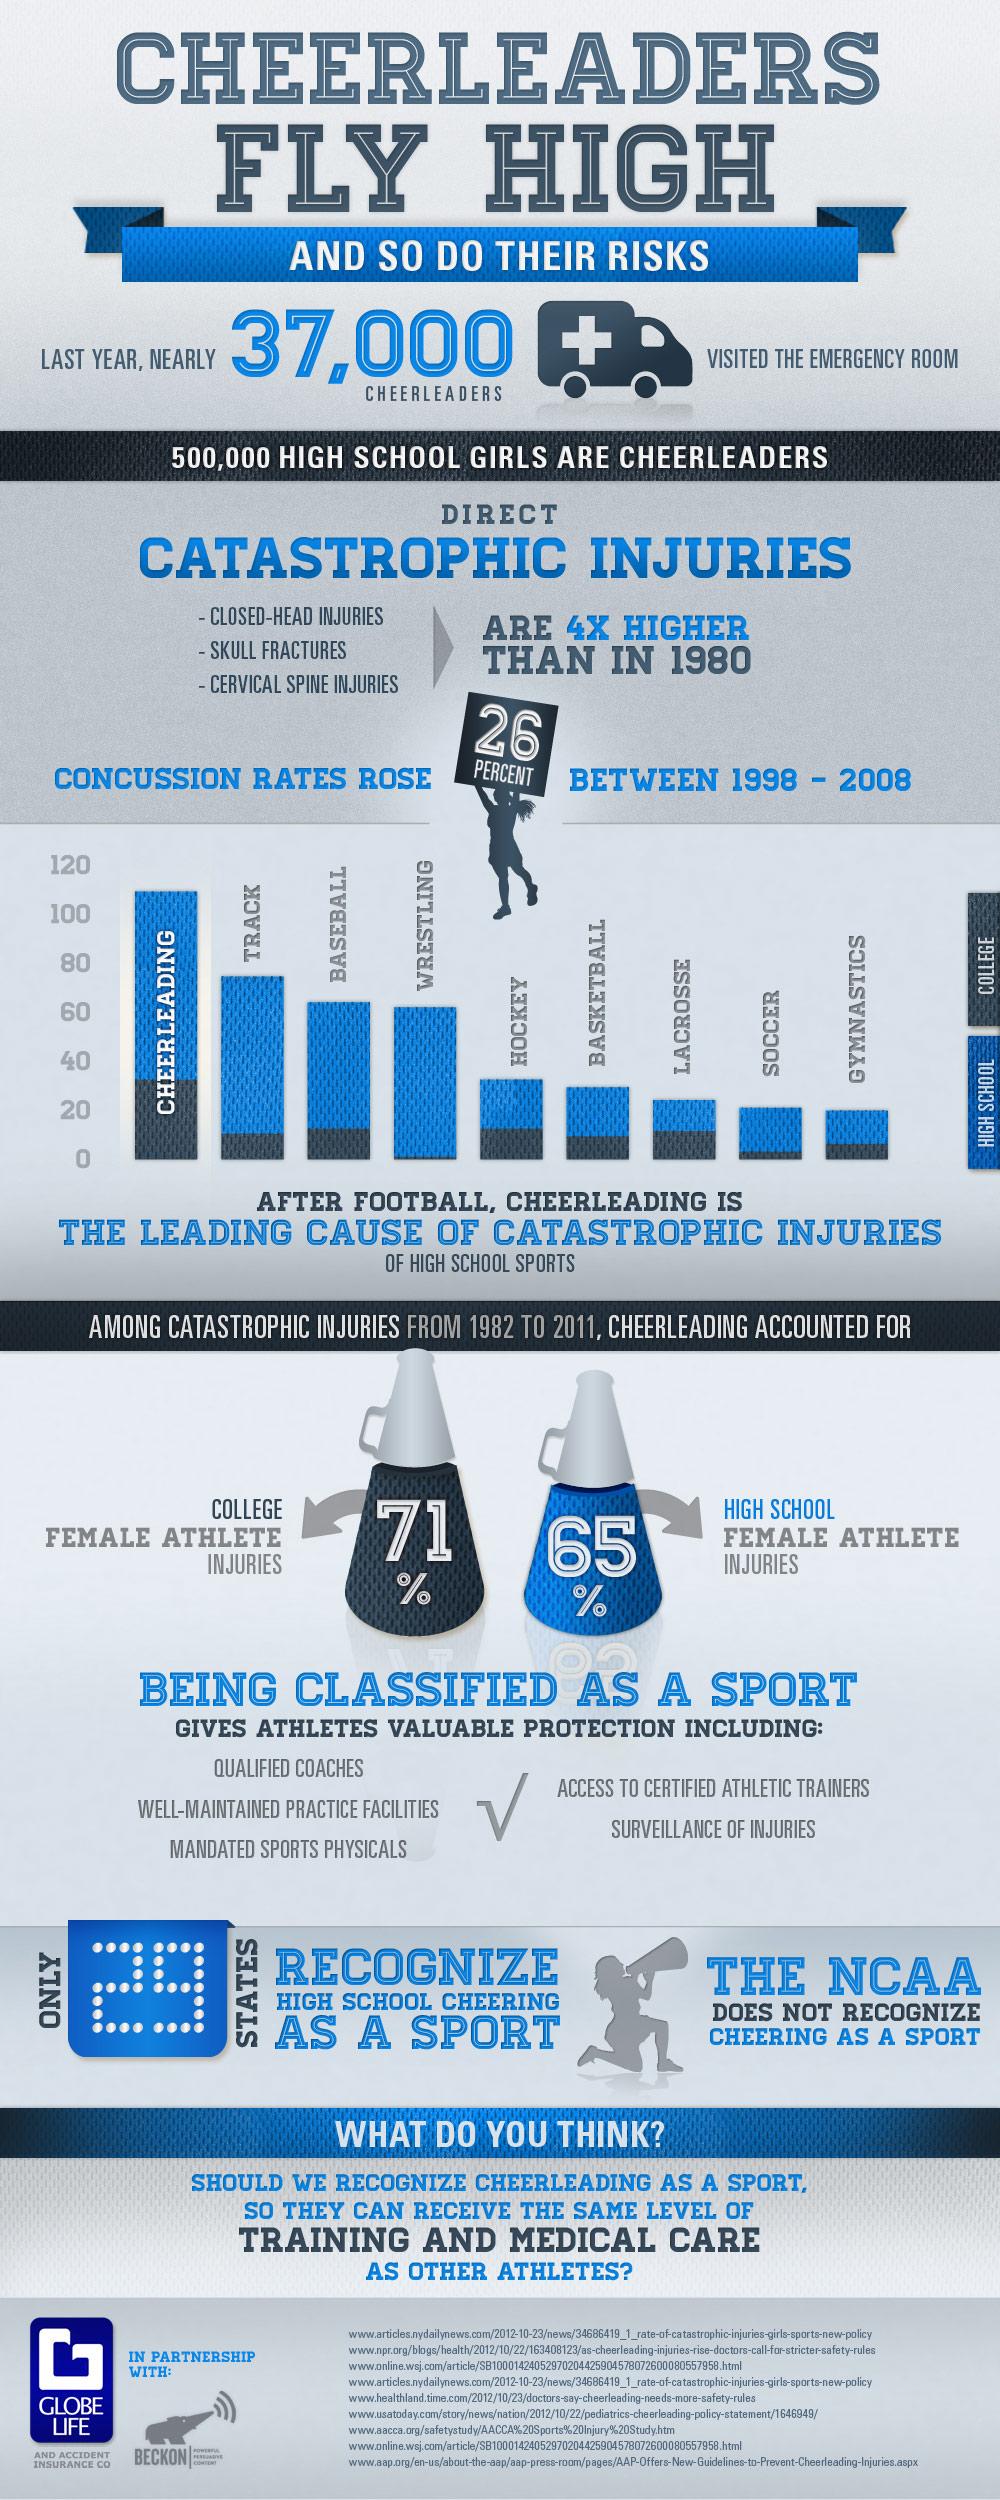 cheerleaders-fly-high-and-so-do-their-risks_50d1e85373568